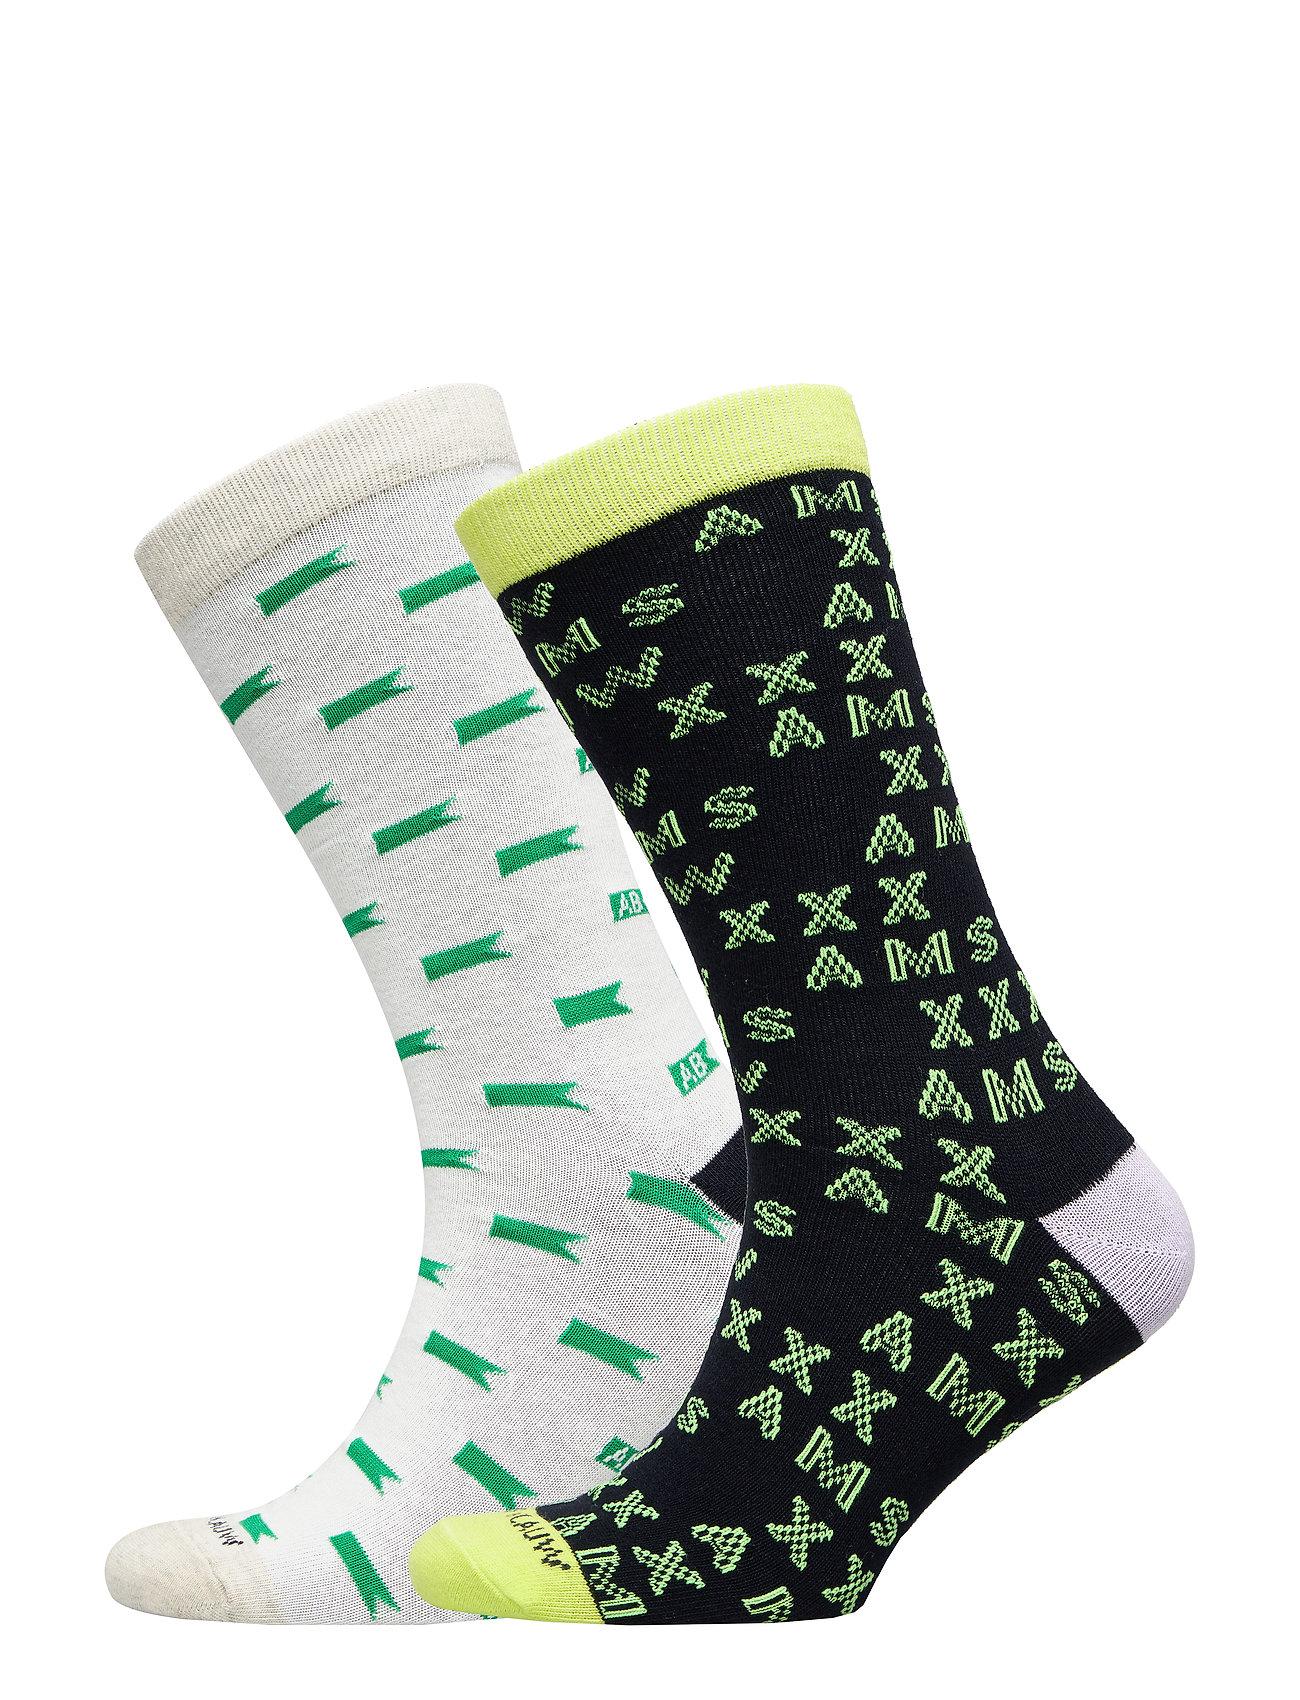 Image of Ams Blauw 2-Pack Seasonal Socks Underwear Socks Regular Socks Grøn Scotch & Soda (3275198783)